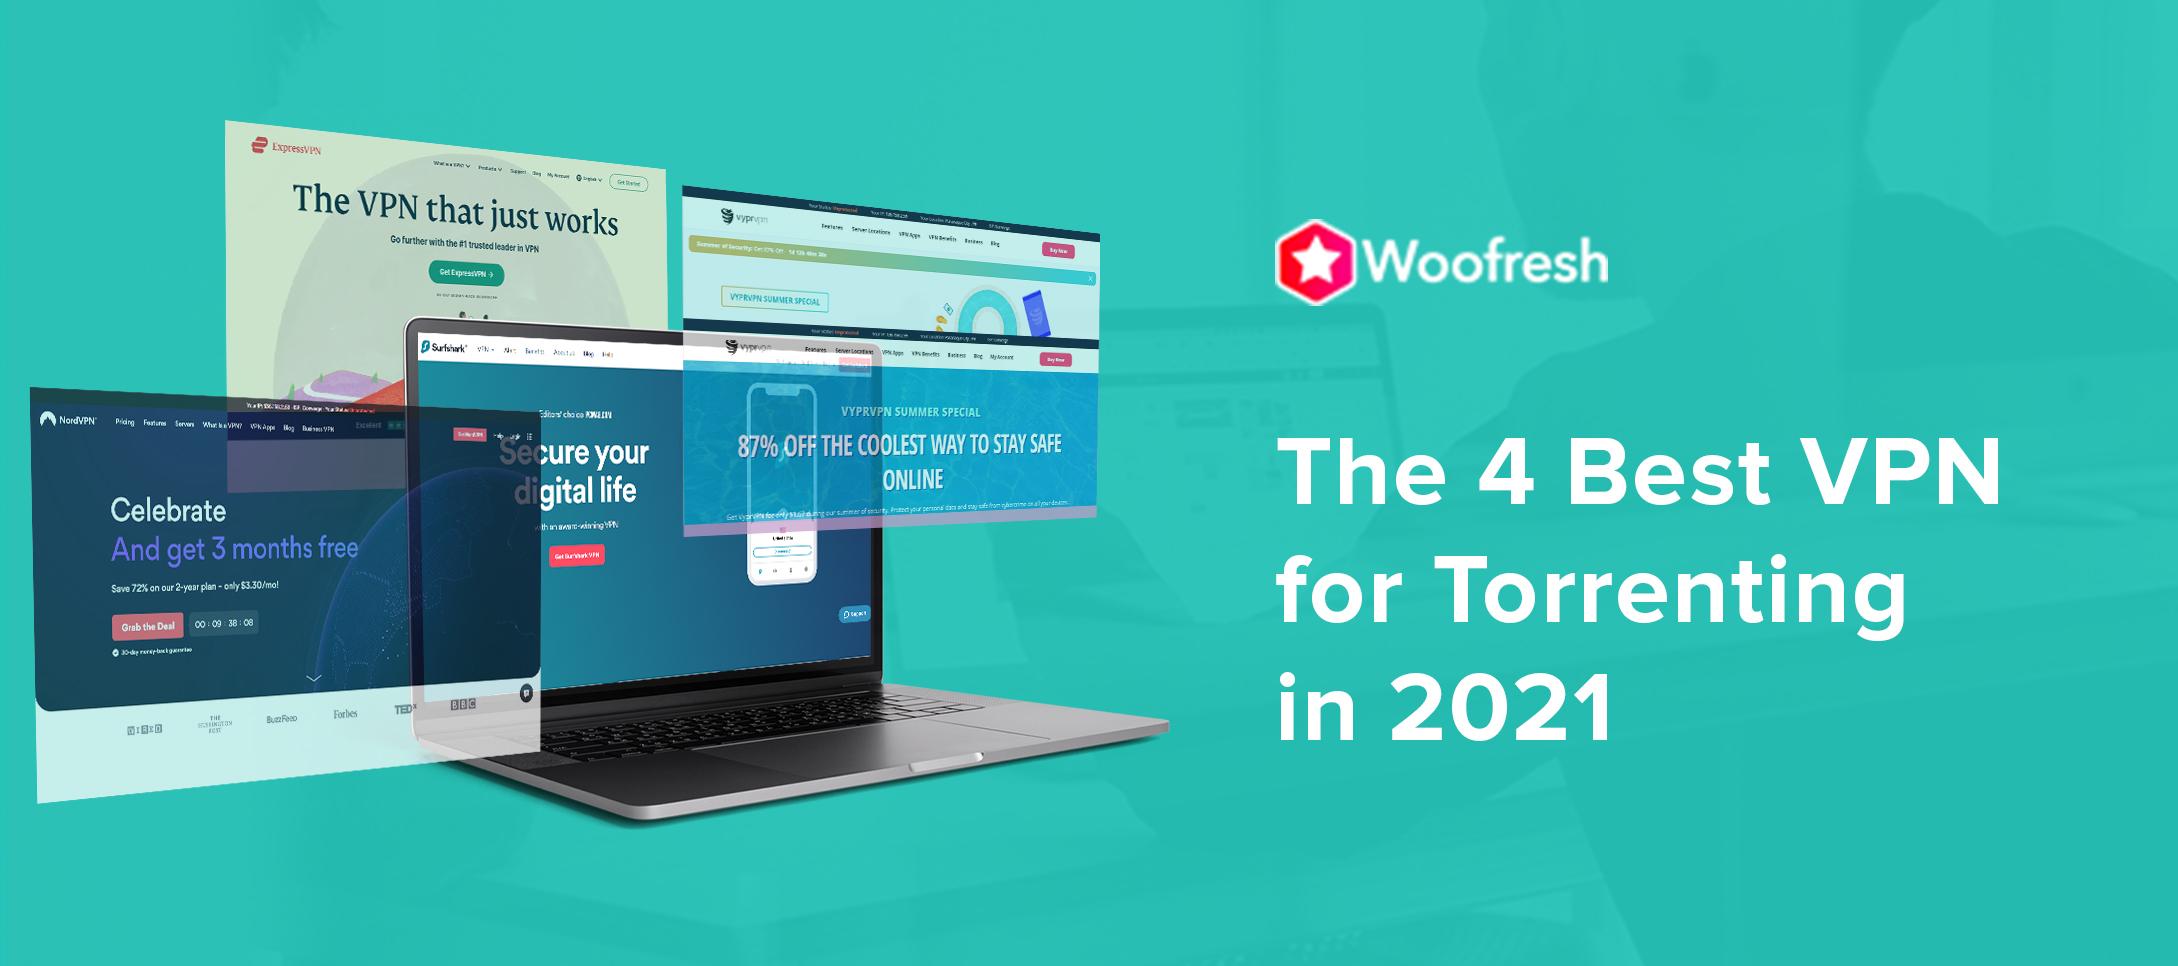 The 4 Best VPN for Torrenting in 2021